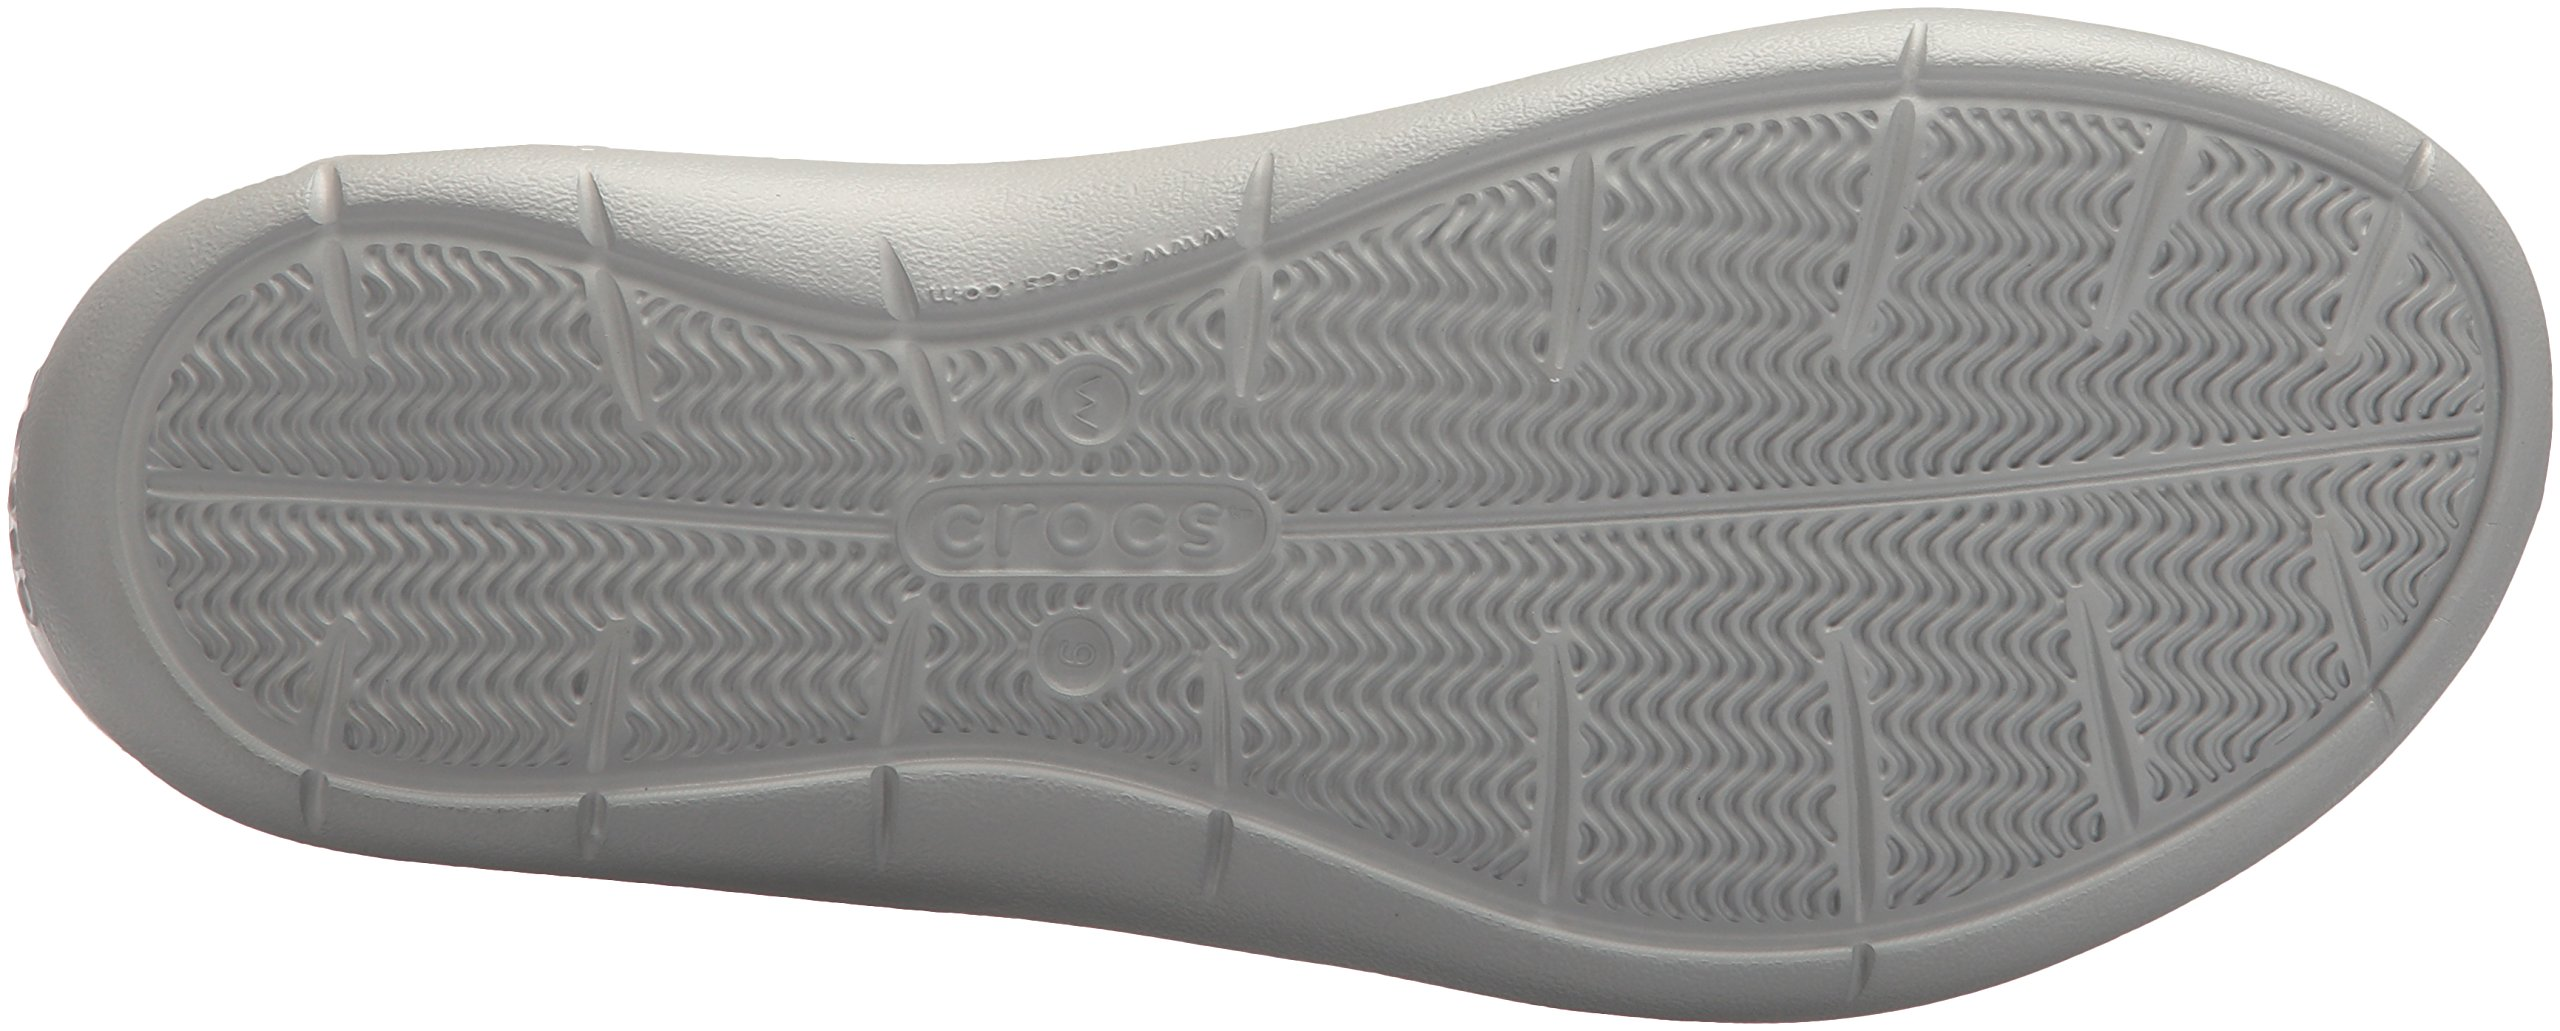 90c6debab2cf06 Crocs Women s Swiftwater Graphic Sandal W Sport